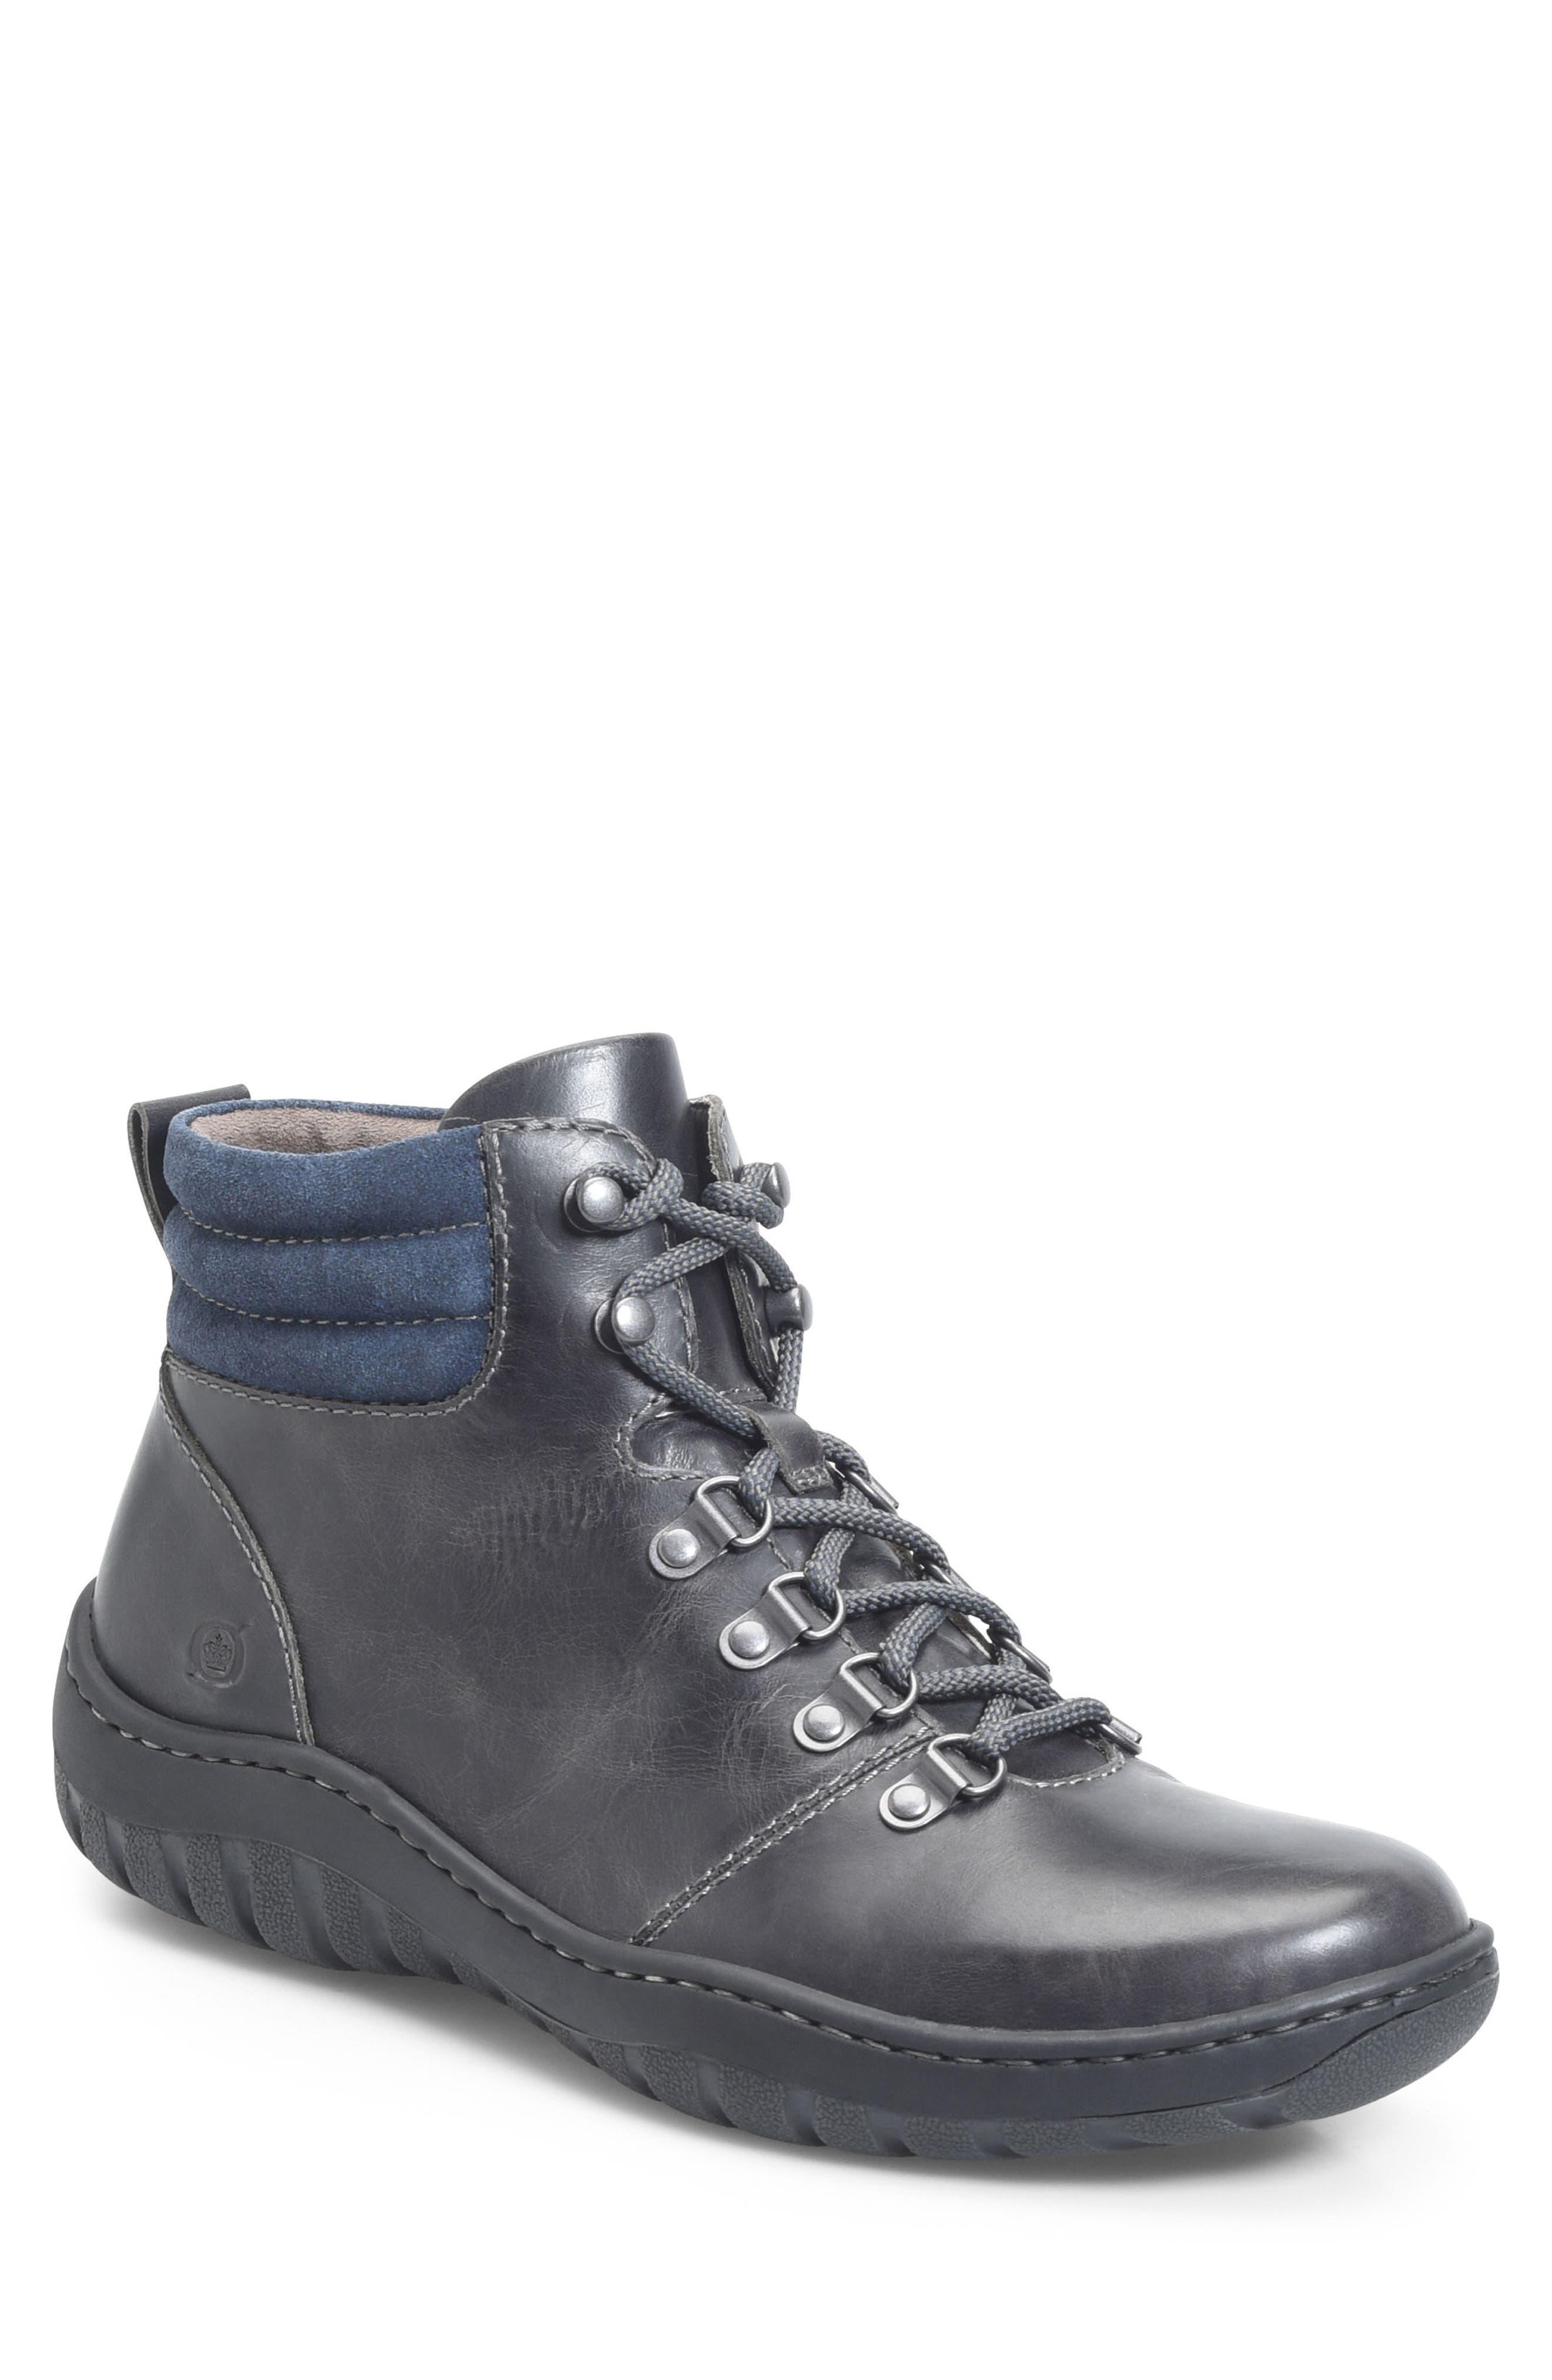 Alternate Image 1 Selected - Børn Dutchman Plain Toe Boot (Men)